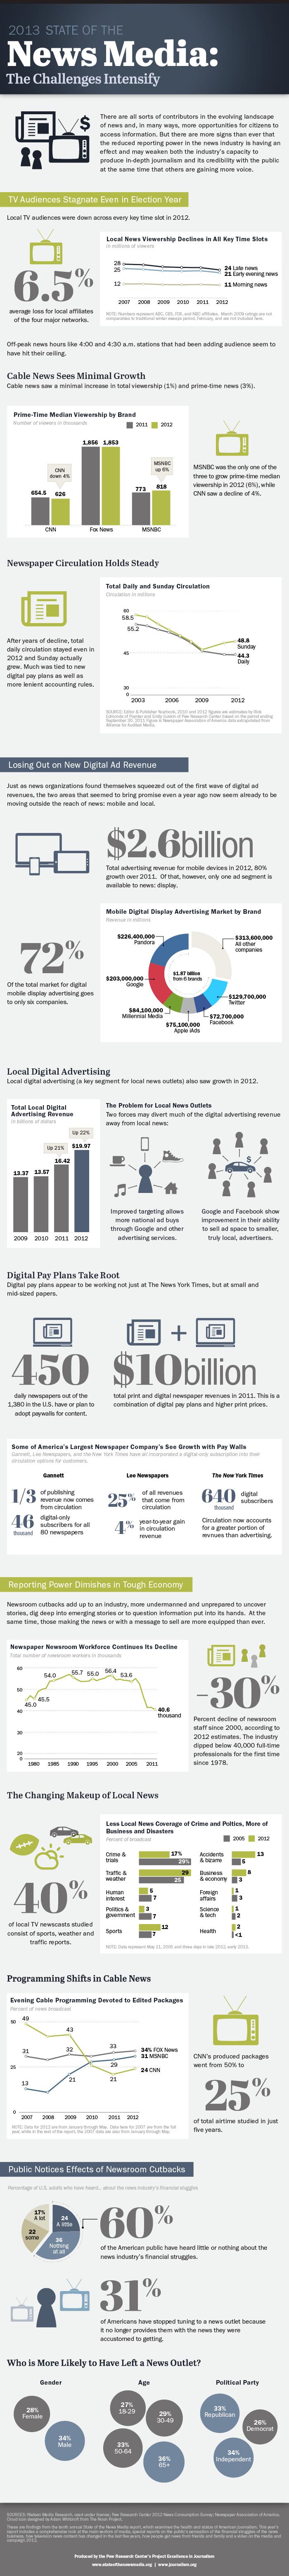 PJ_13.03.19_stateNewsMedia-Infographic-7001